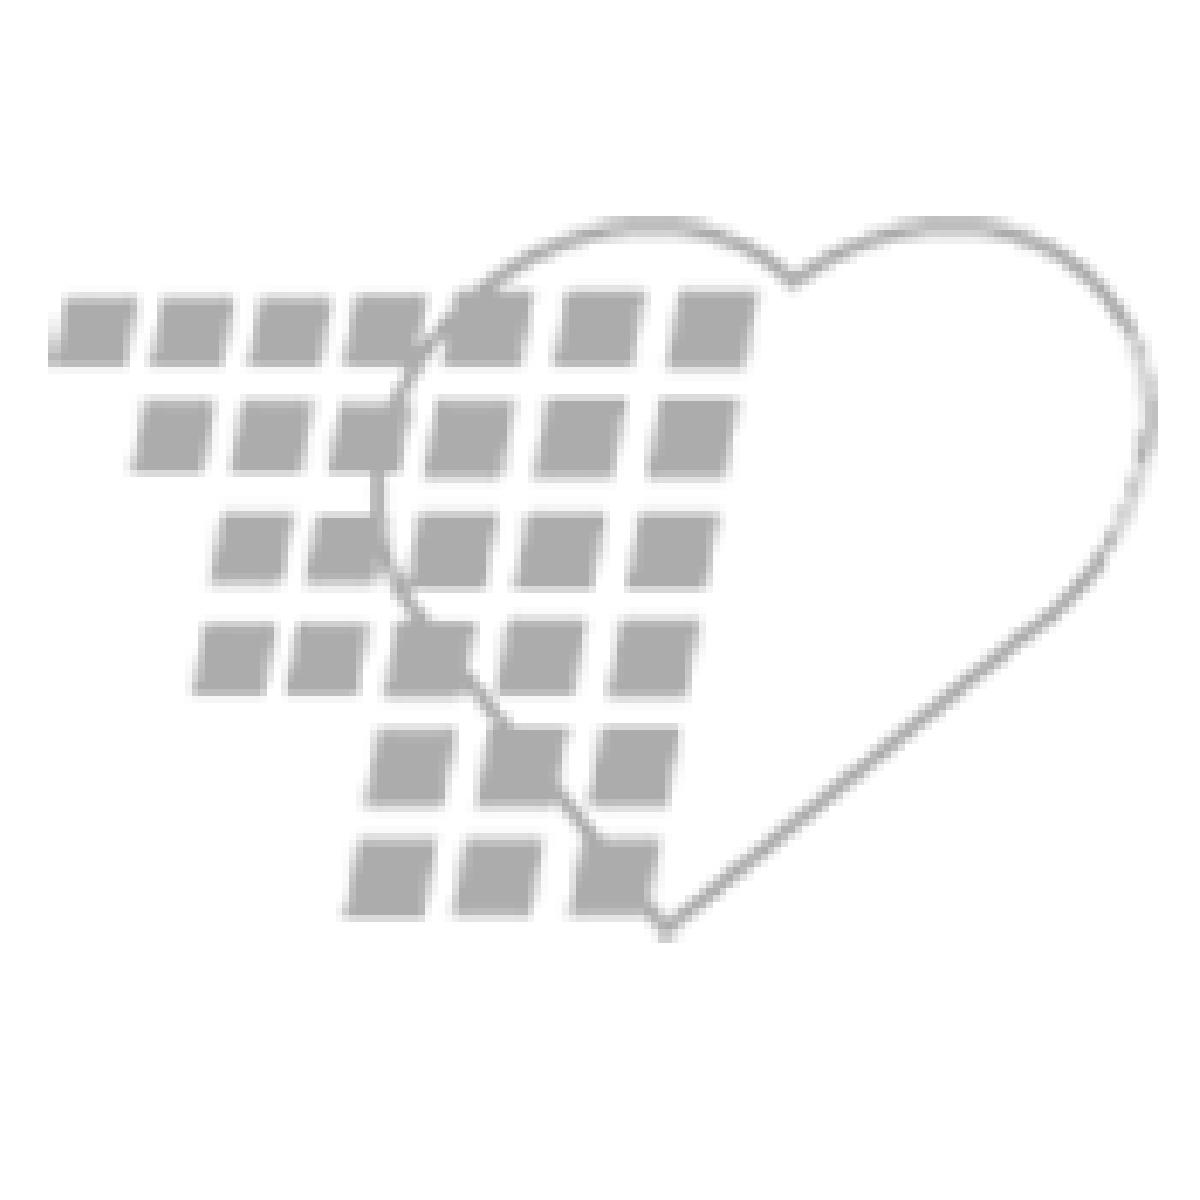 04-25-954 Stackable Storage Bin